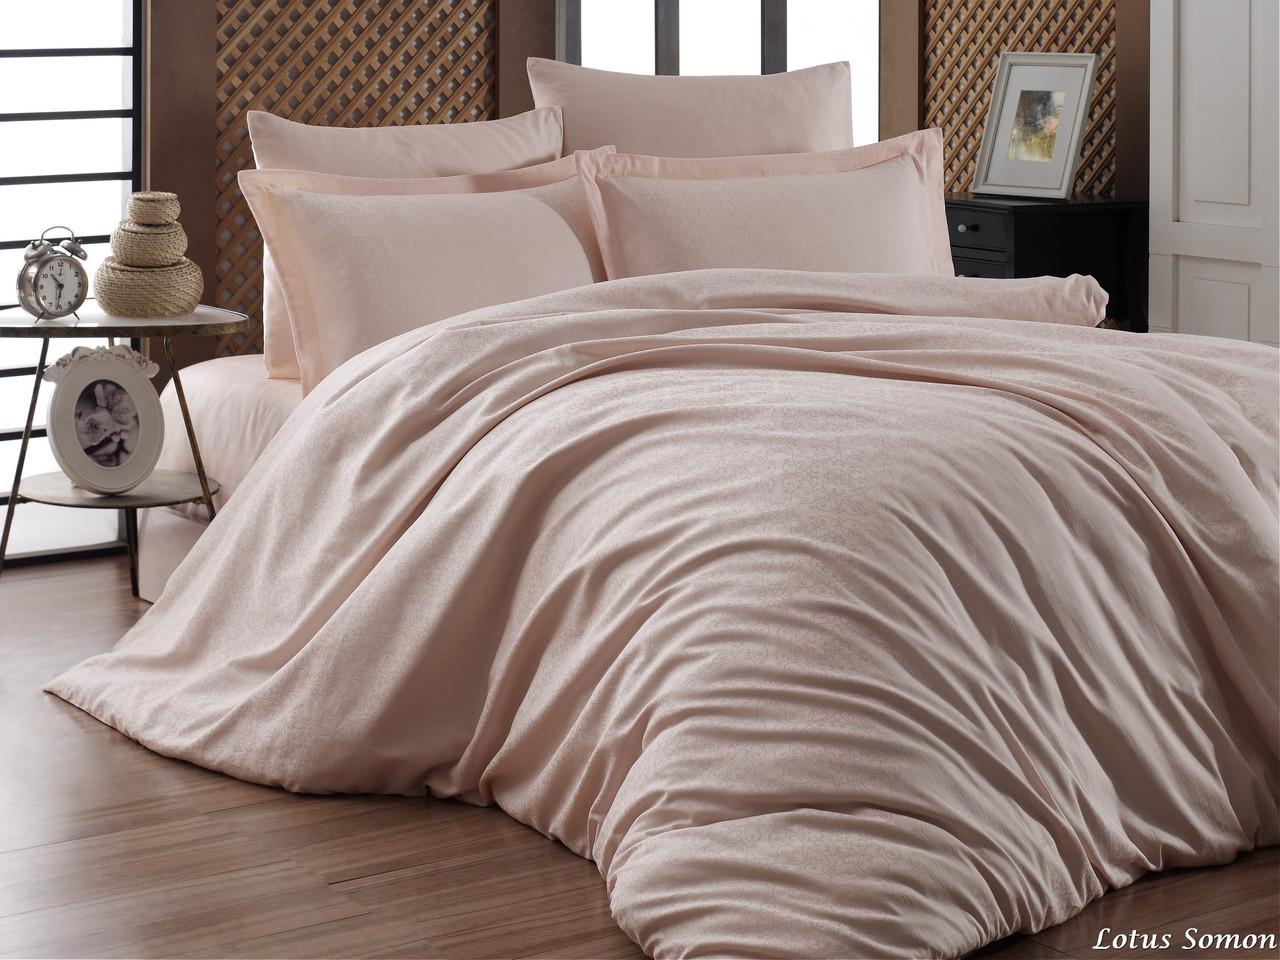 Комплект постельного белья First Choice Сатин Жаккард 200х220 Lotus Somon